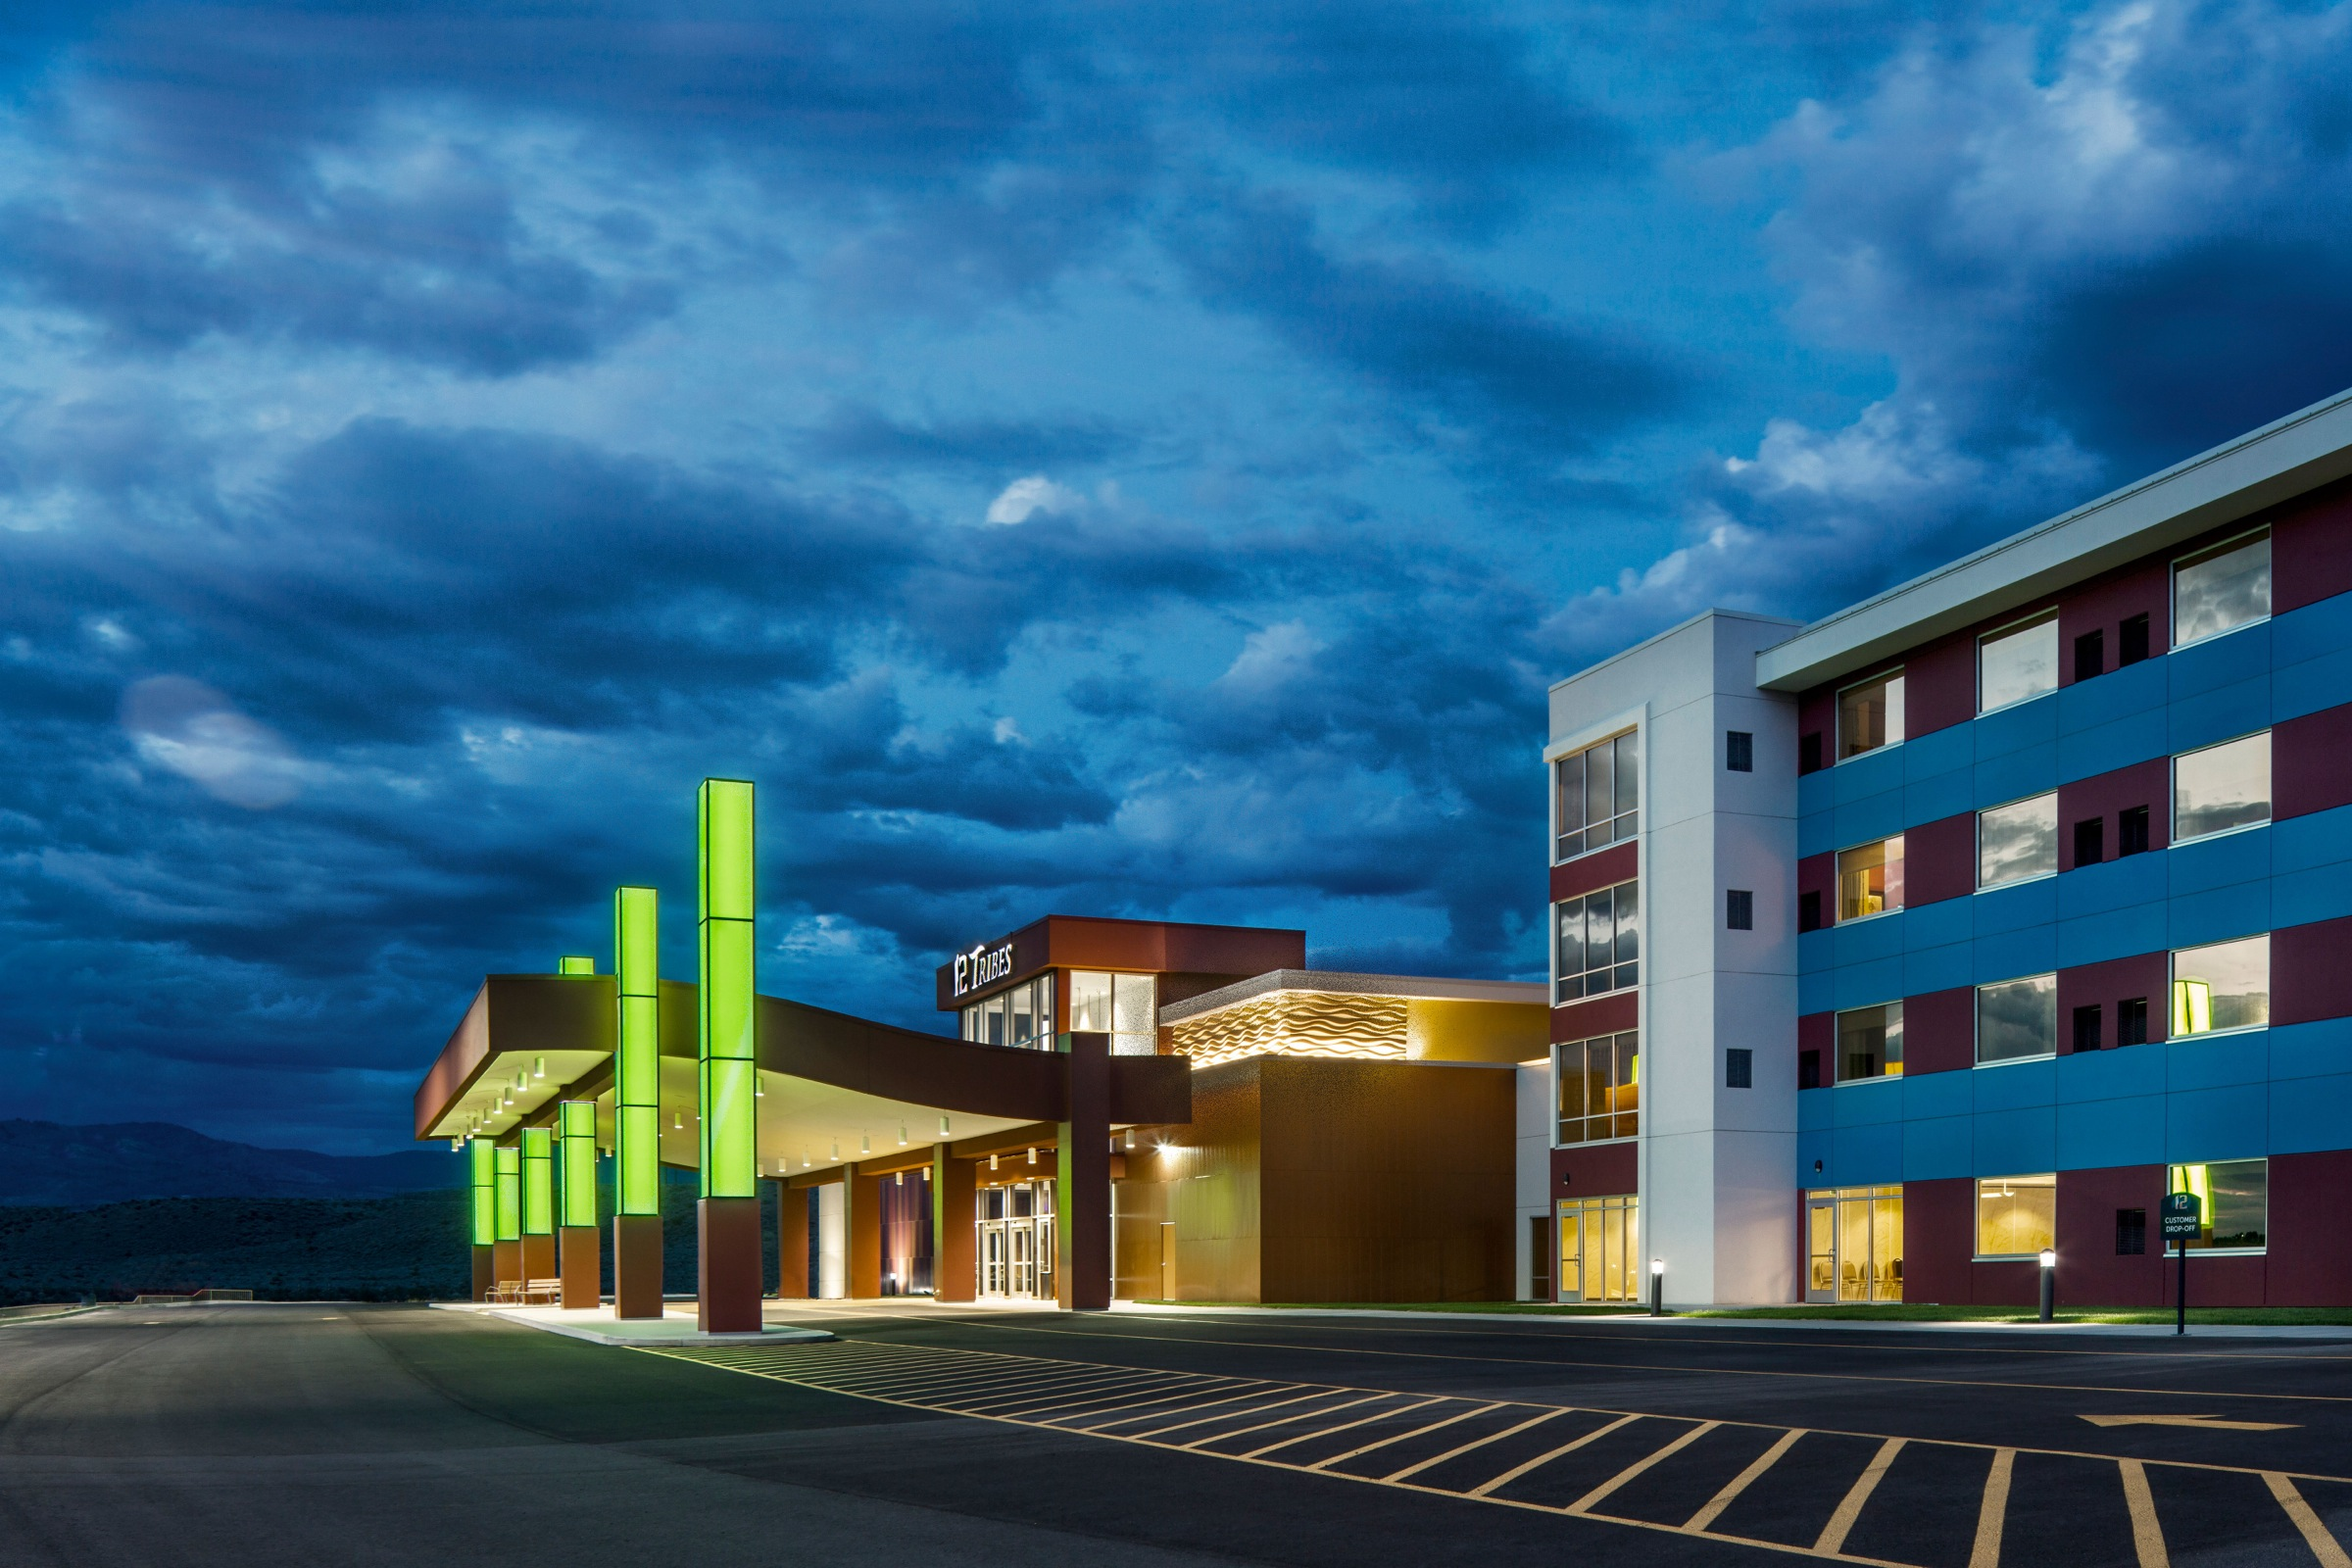 New casino in omak washington